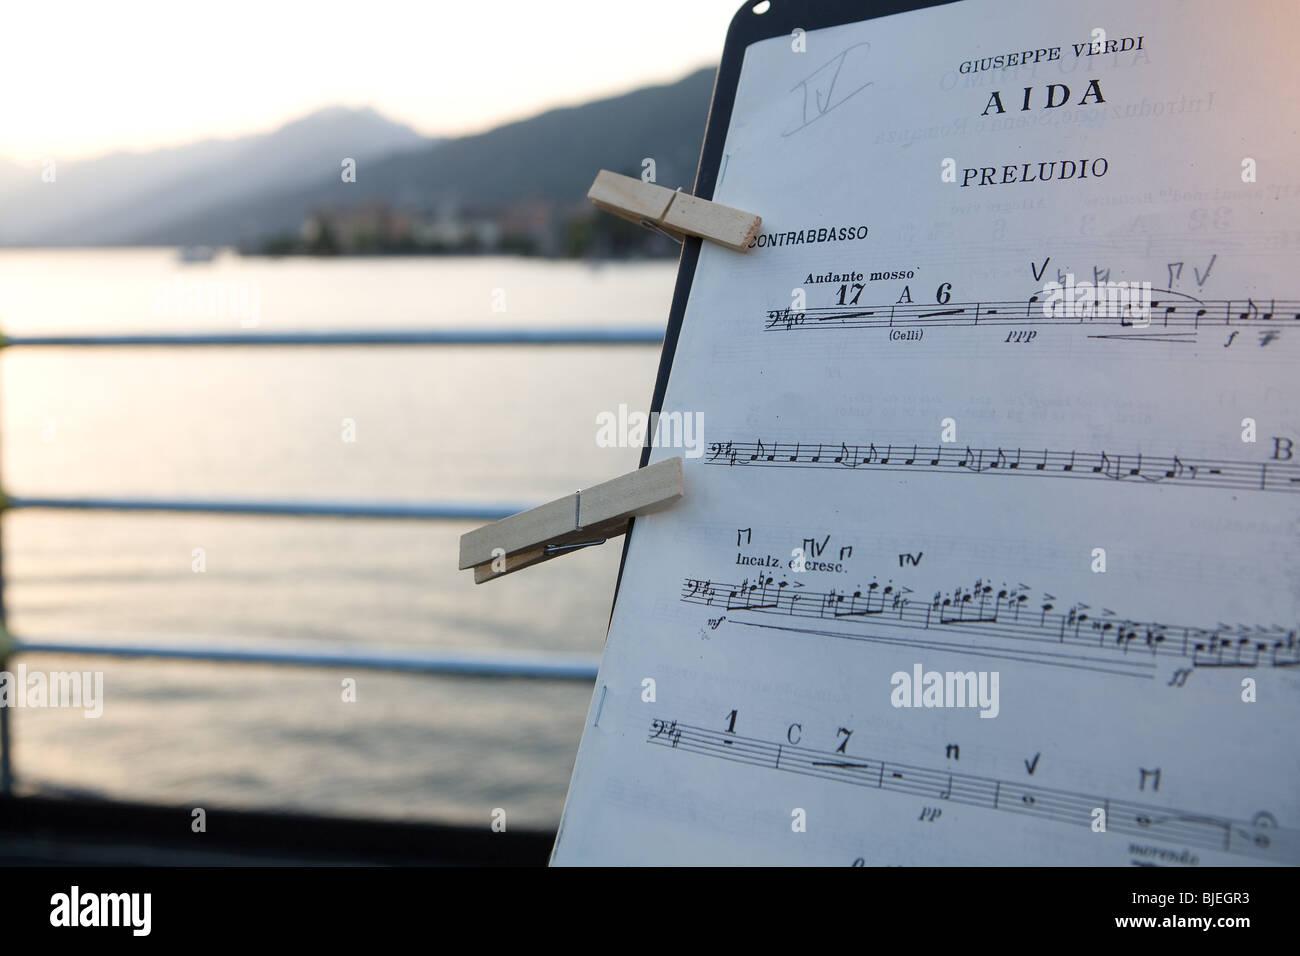 Europe, Italy, Piemonte, lake Maggiore, concerts, Stresa, musical, scores - Stock Image